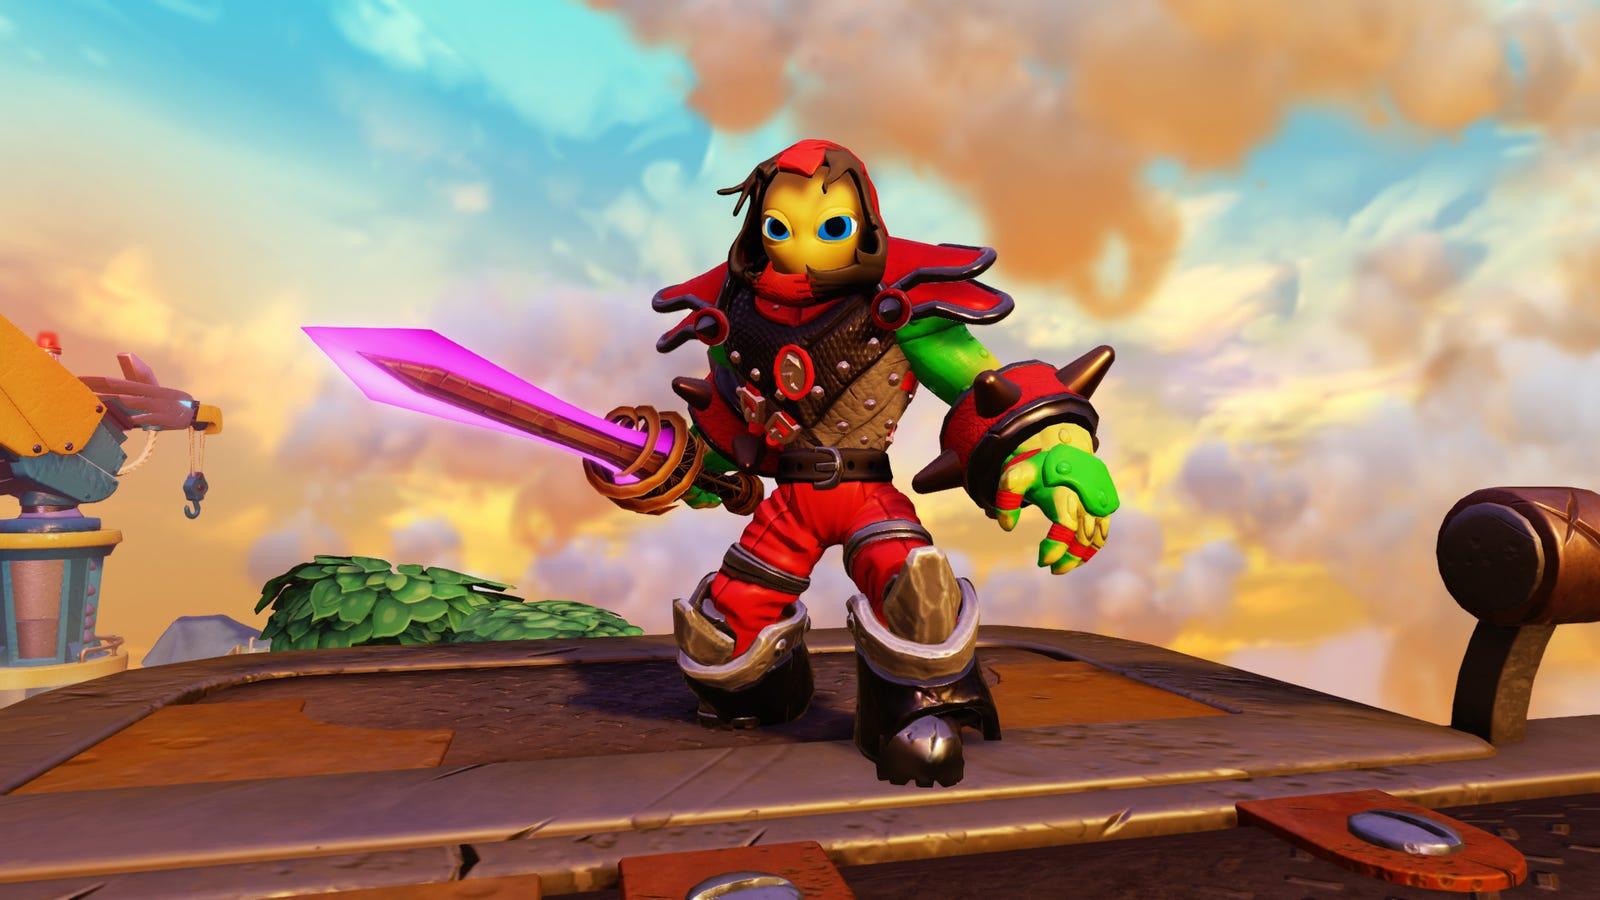 skylanders imaginators players can 3d print their custom characters